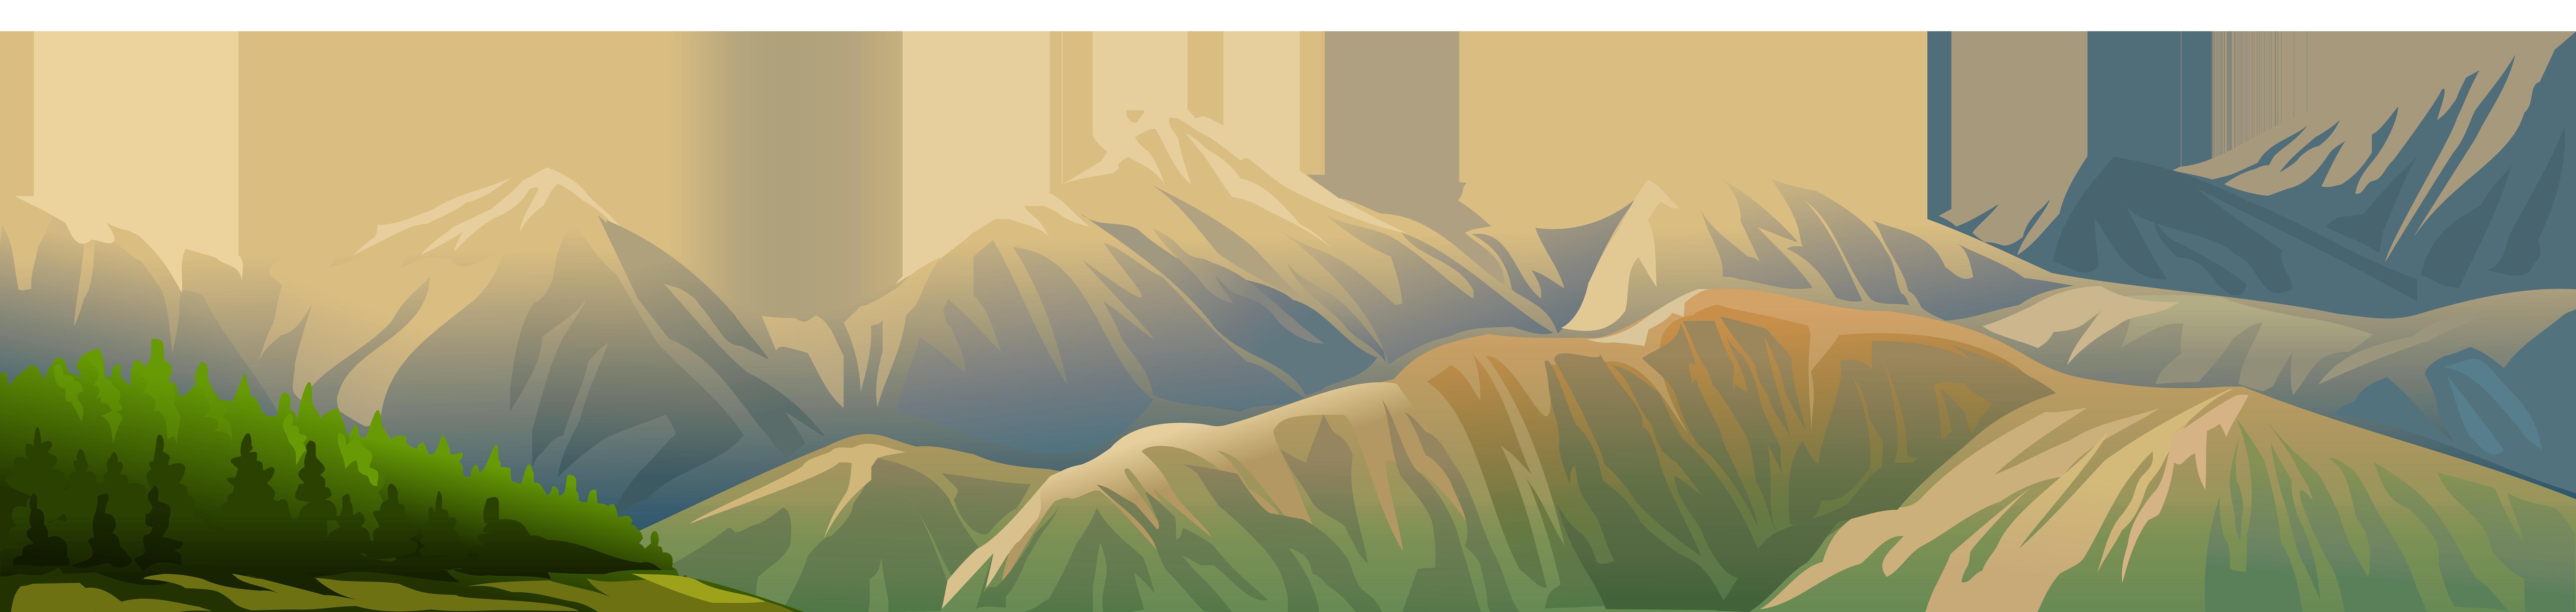 All terrain clipart banner stock Lake clipart terrain, Lake terrain Transparent FREE for download on ... banner stock